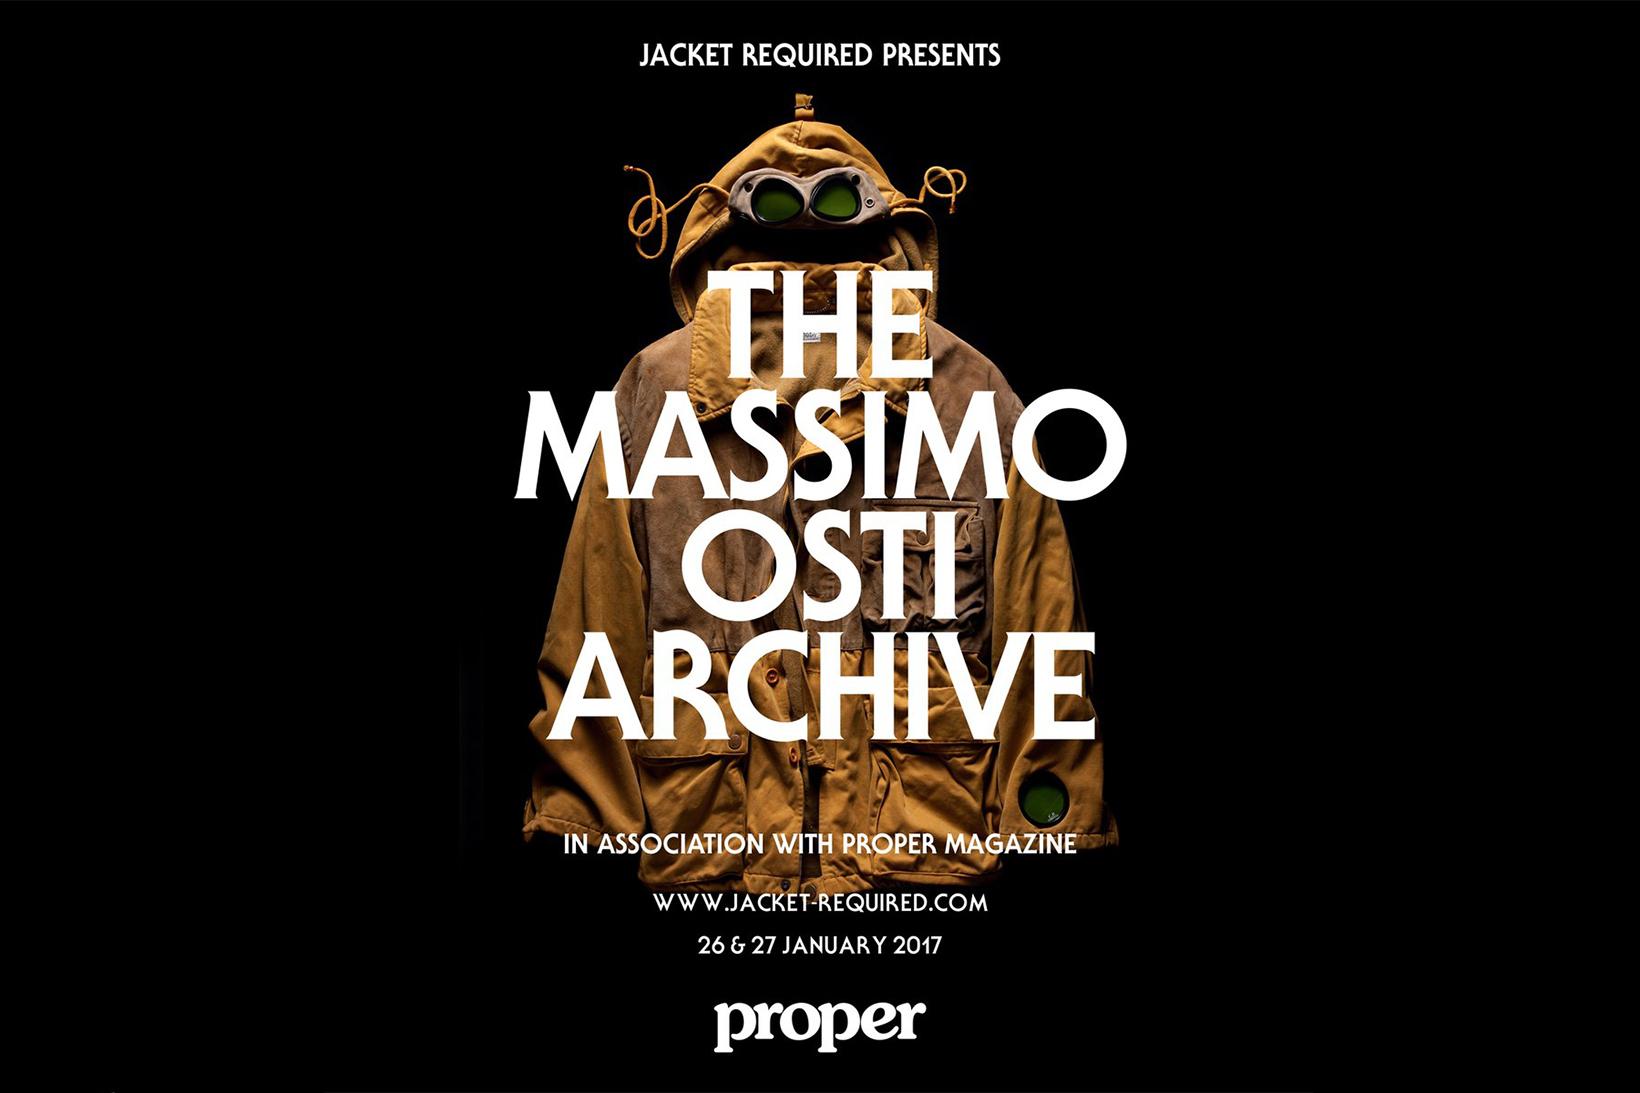 Massimo Osti Archive London Proper Magazine Jacket Required